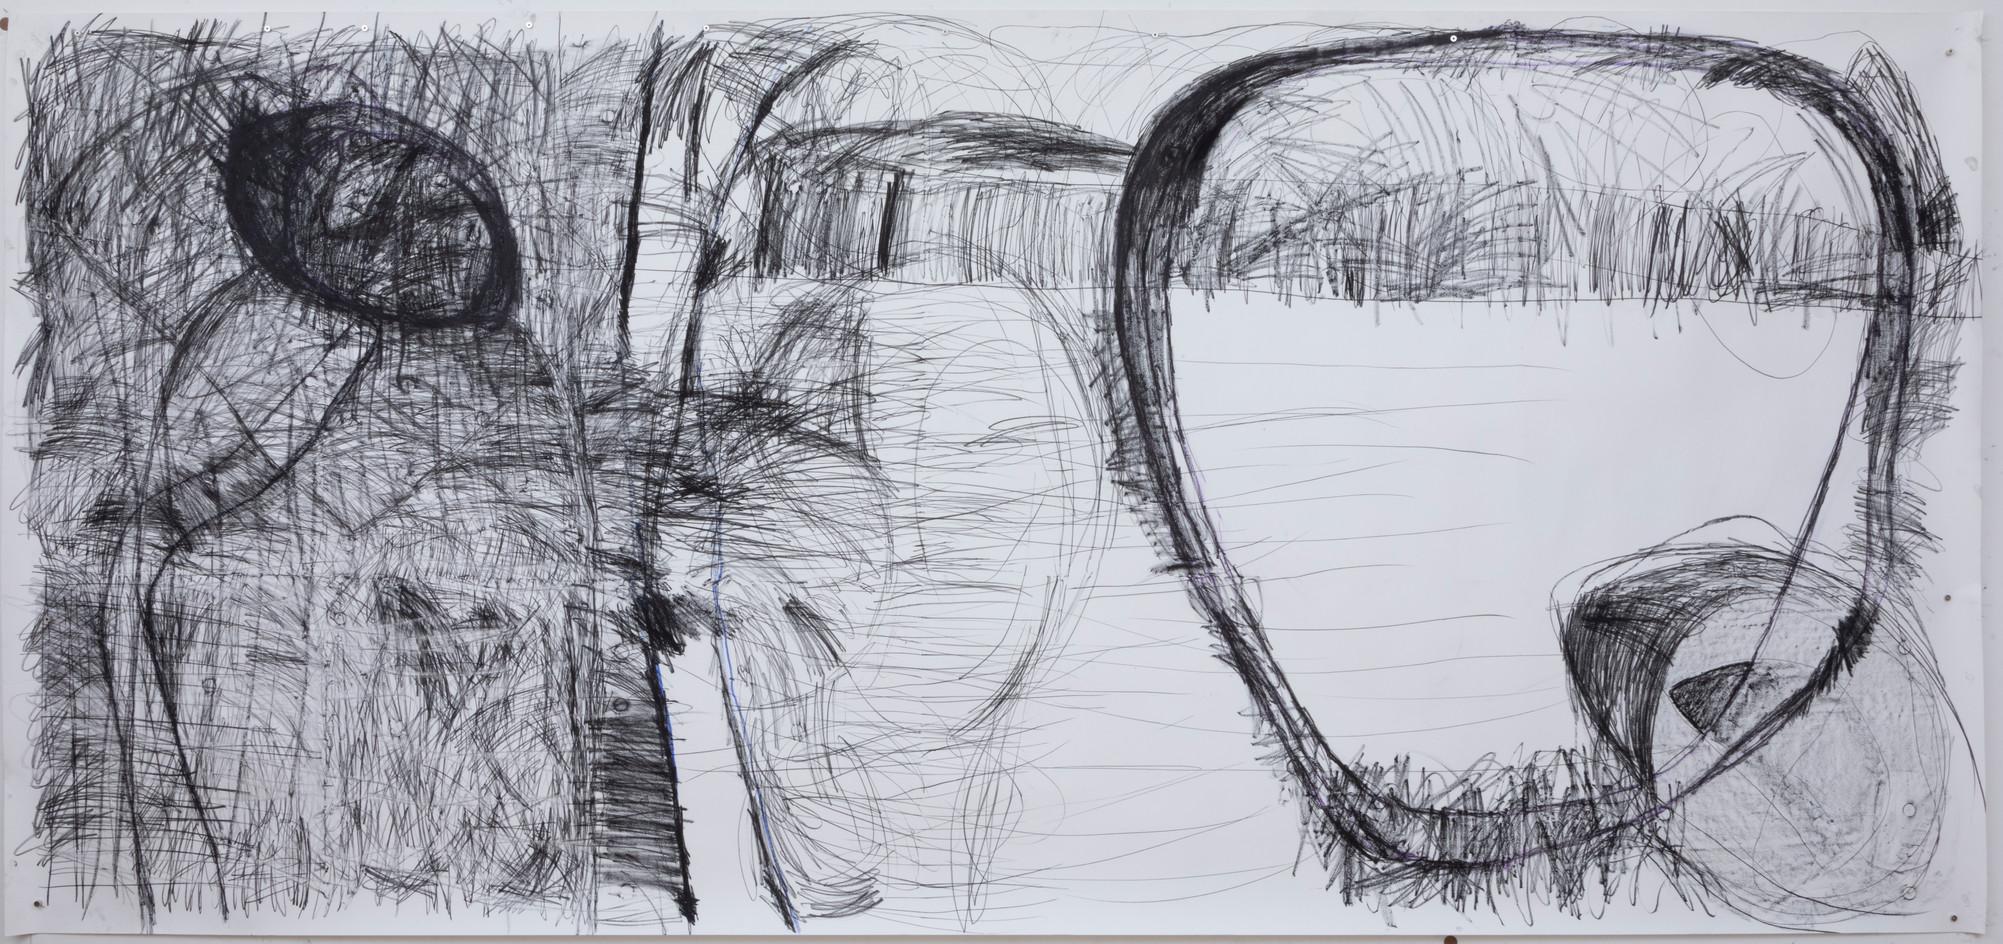 154 x 330 cm lápis conté e giz pastel seco sobre papel foto: Ruy Teixeira